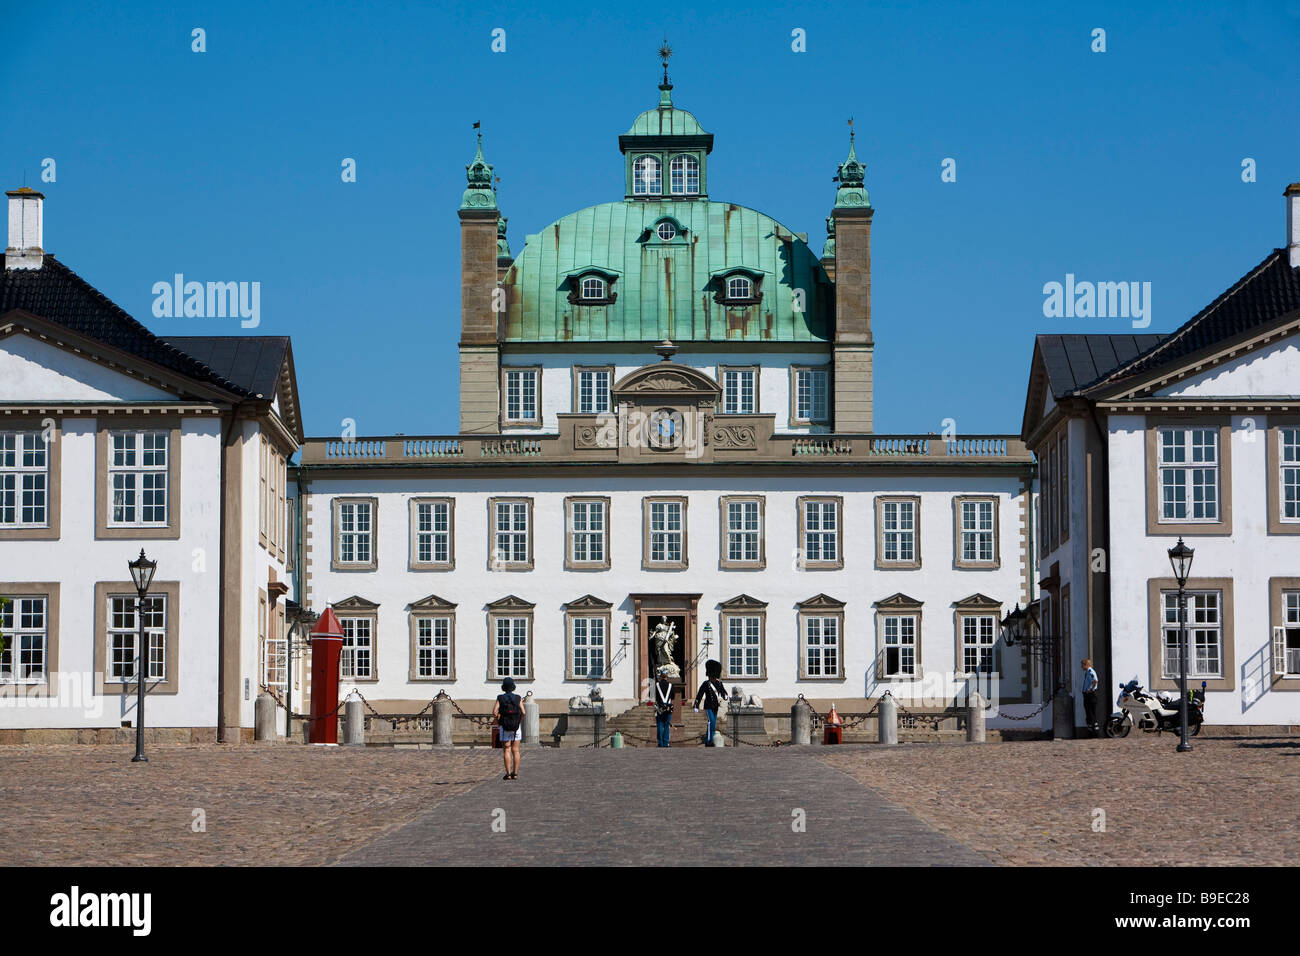 Fredensborg castle Fredensborg Zealand Denmark - Stock Image